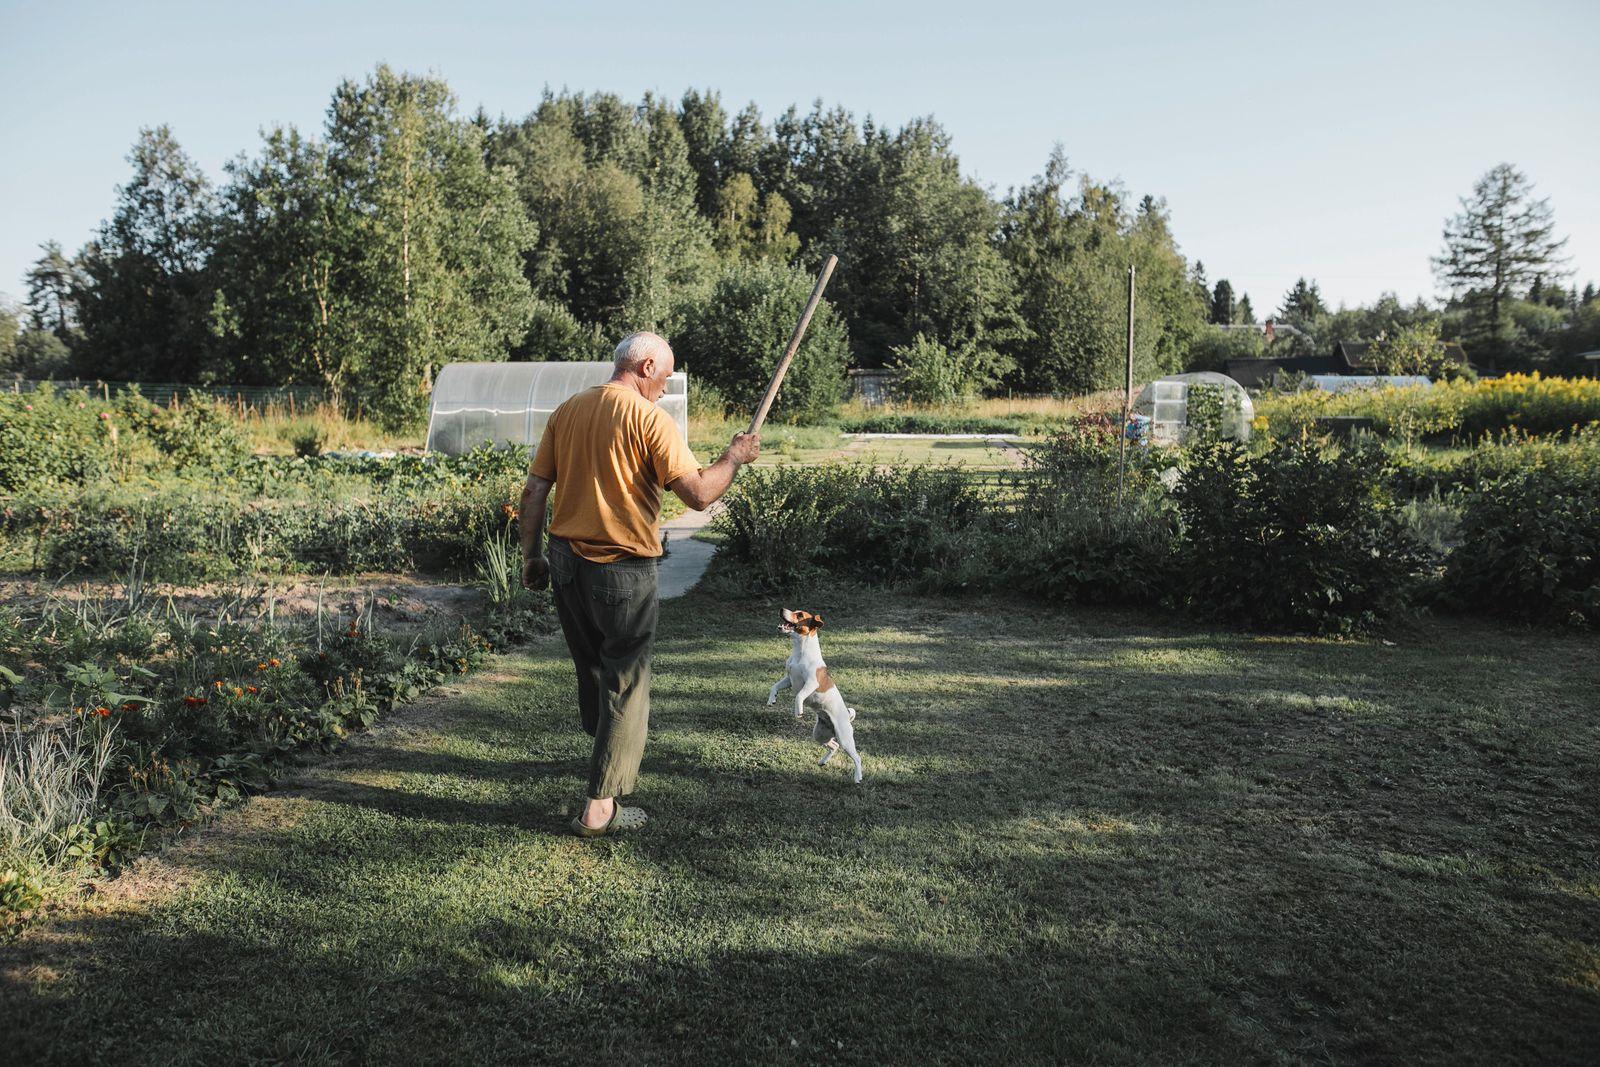 Senior man playing with dog in garden